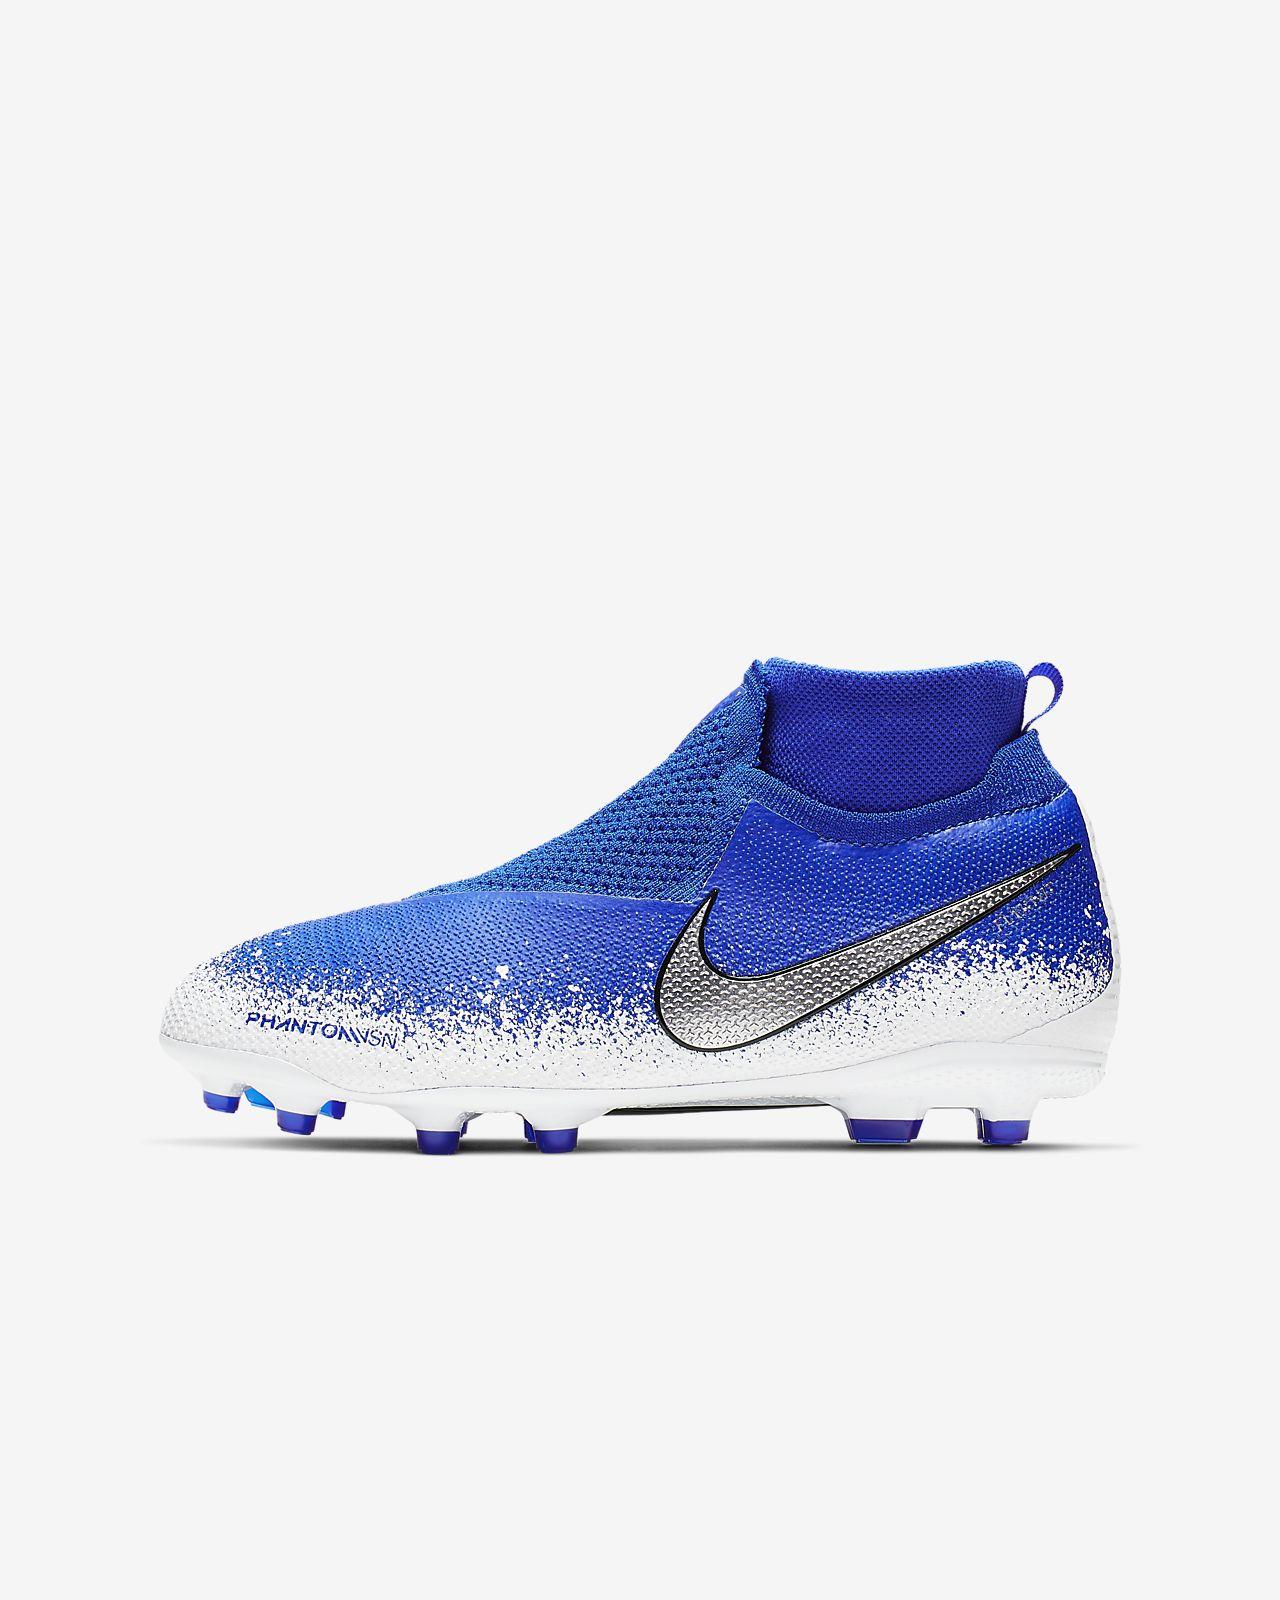 54a7f568d ... Calzado de fútbol para múltiples superficies para niños talla grande  Nike Jr. Phantom Vision Elite